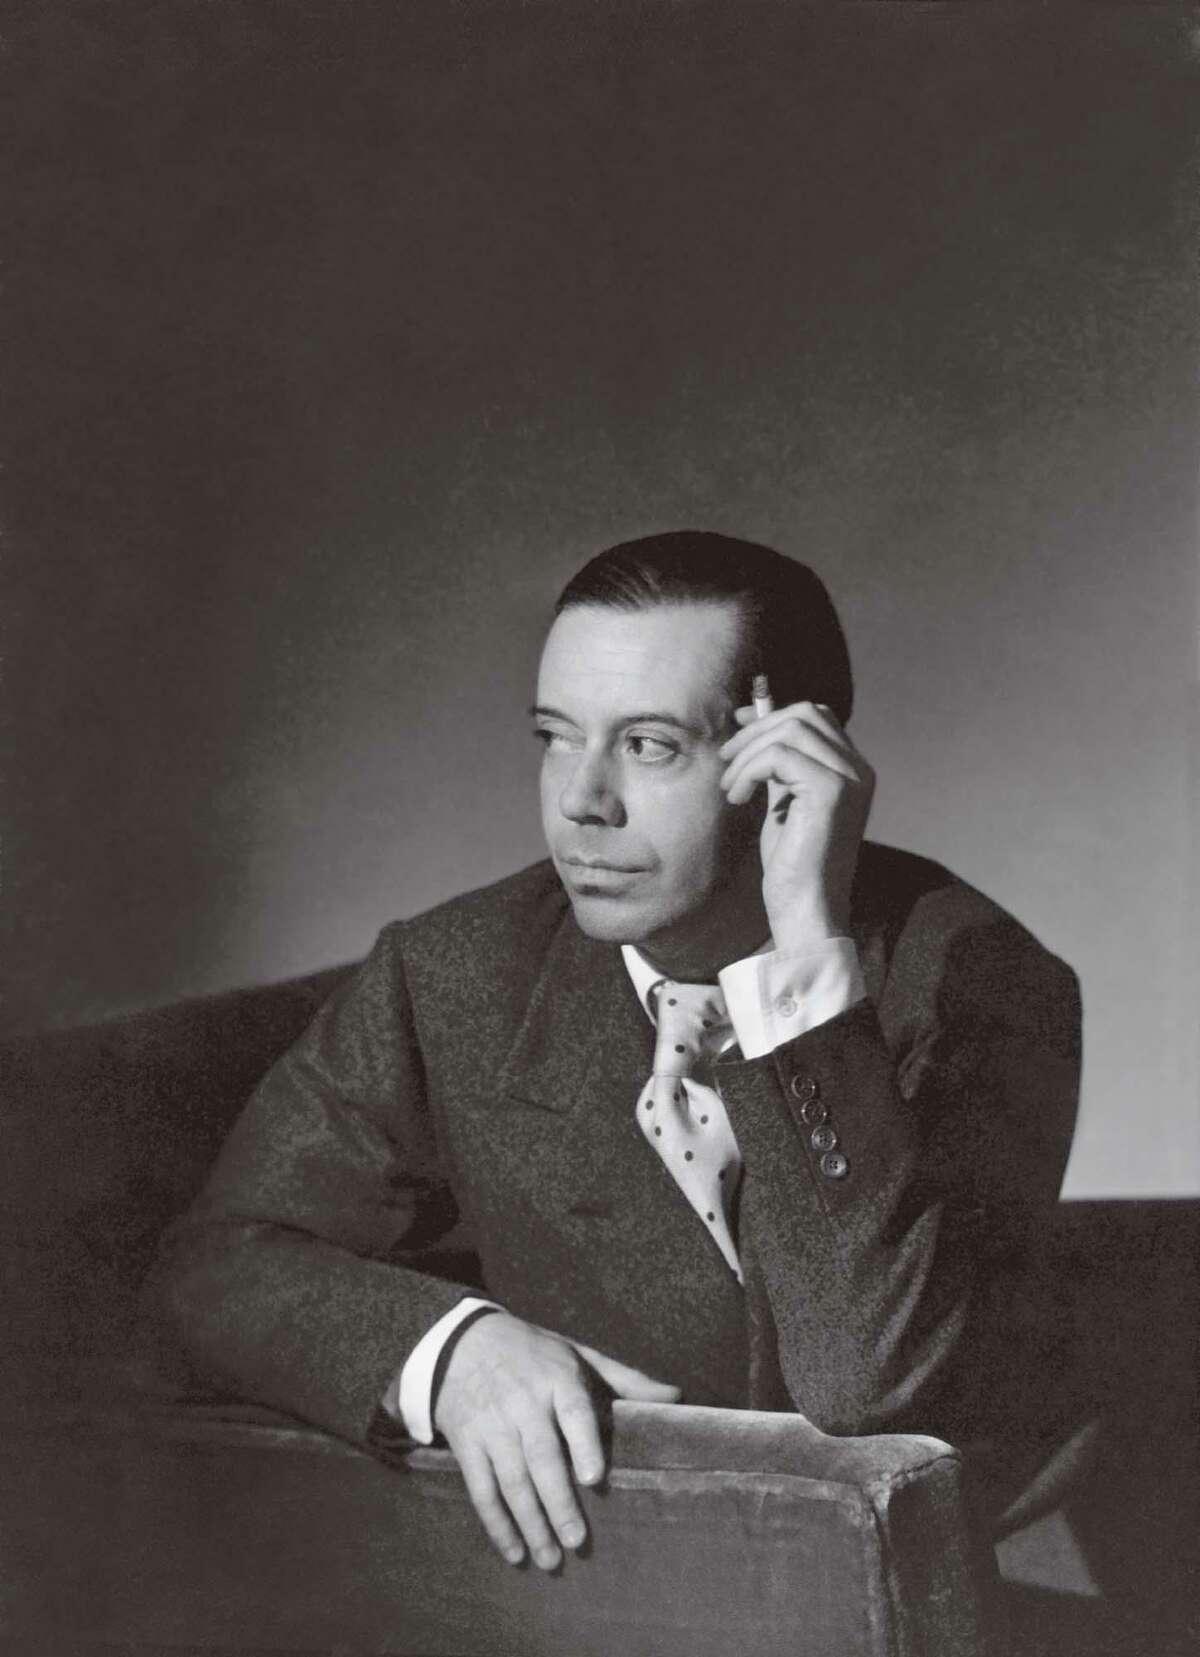 Cole Porter in 1934.